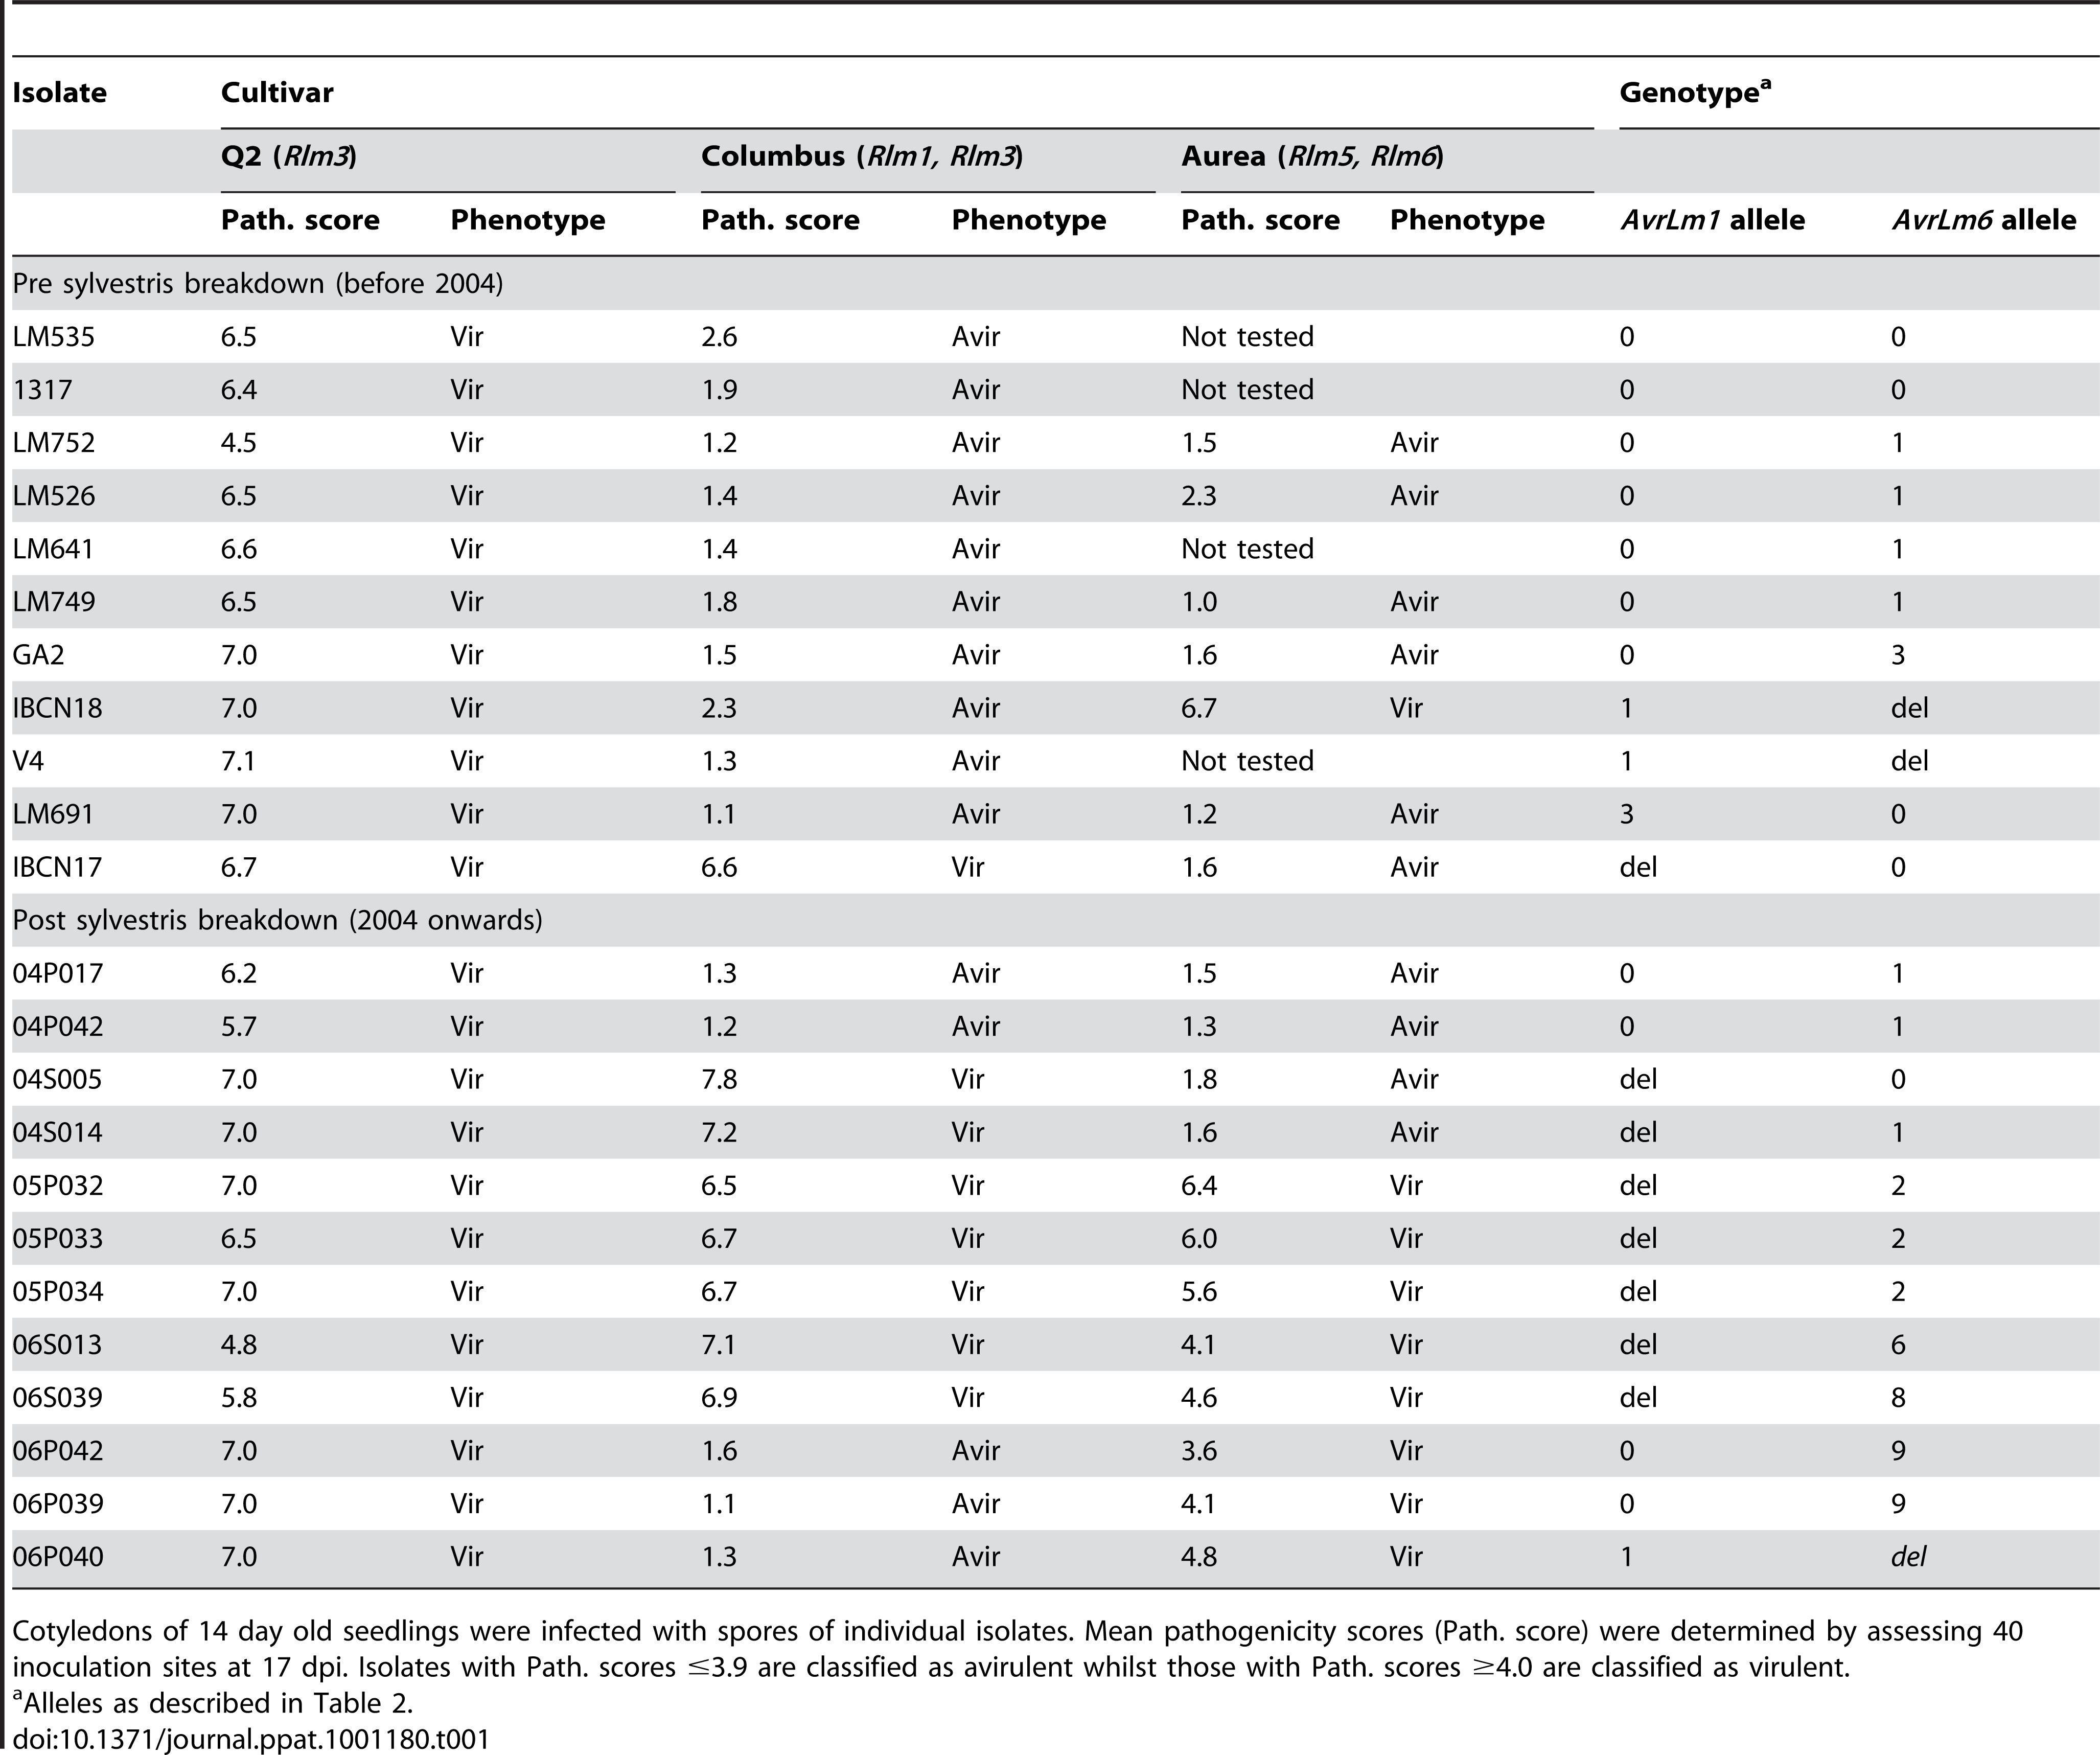 Pathogenicity of Australian isolates of <i>Leptosphaeria maculans</i> on cotyledons of <i>Brassica napus</i> cultivars Q2 and Columbus and <i>B. juncea</i> cv. Aurea.